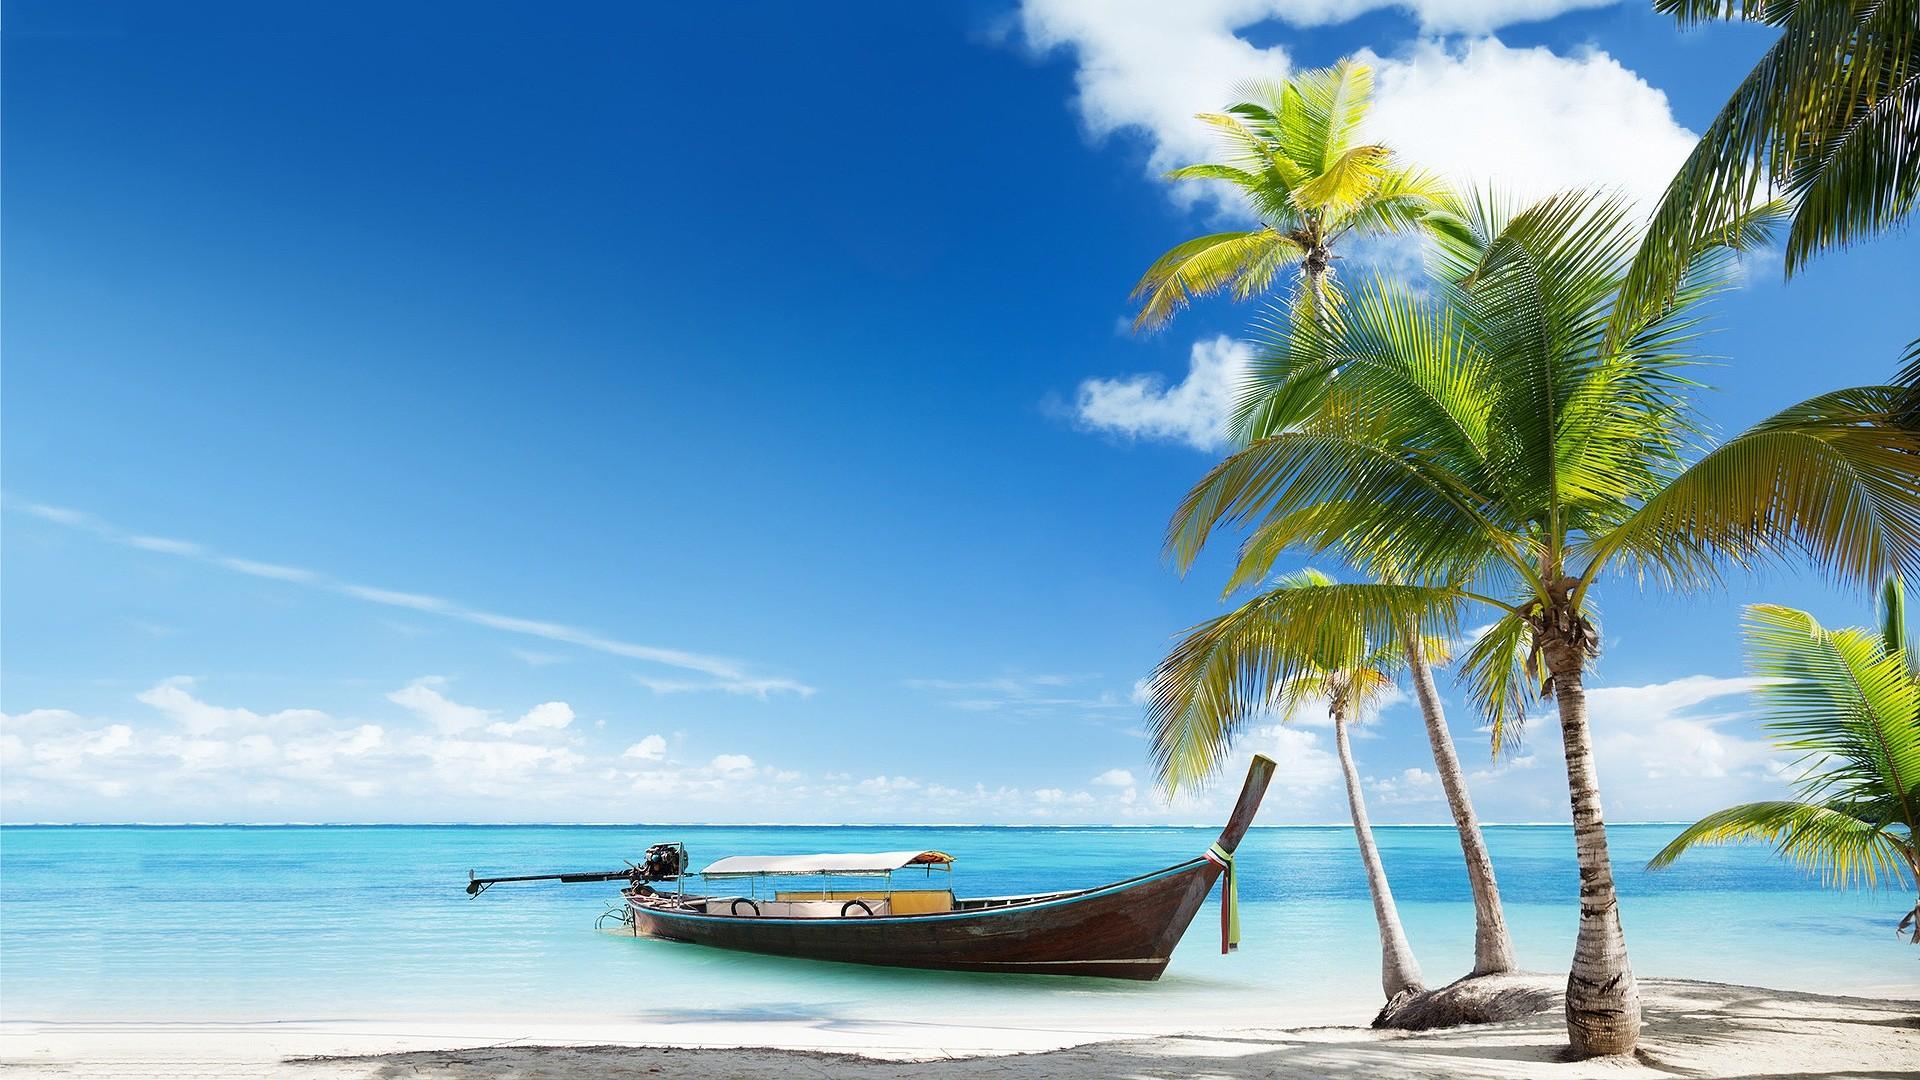 Beach HD Wallpaper Free Download. Boat-Tropical-Beach